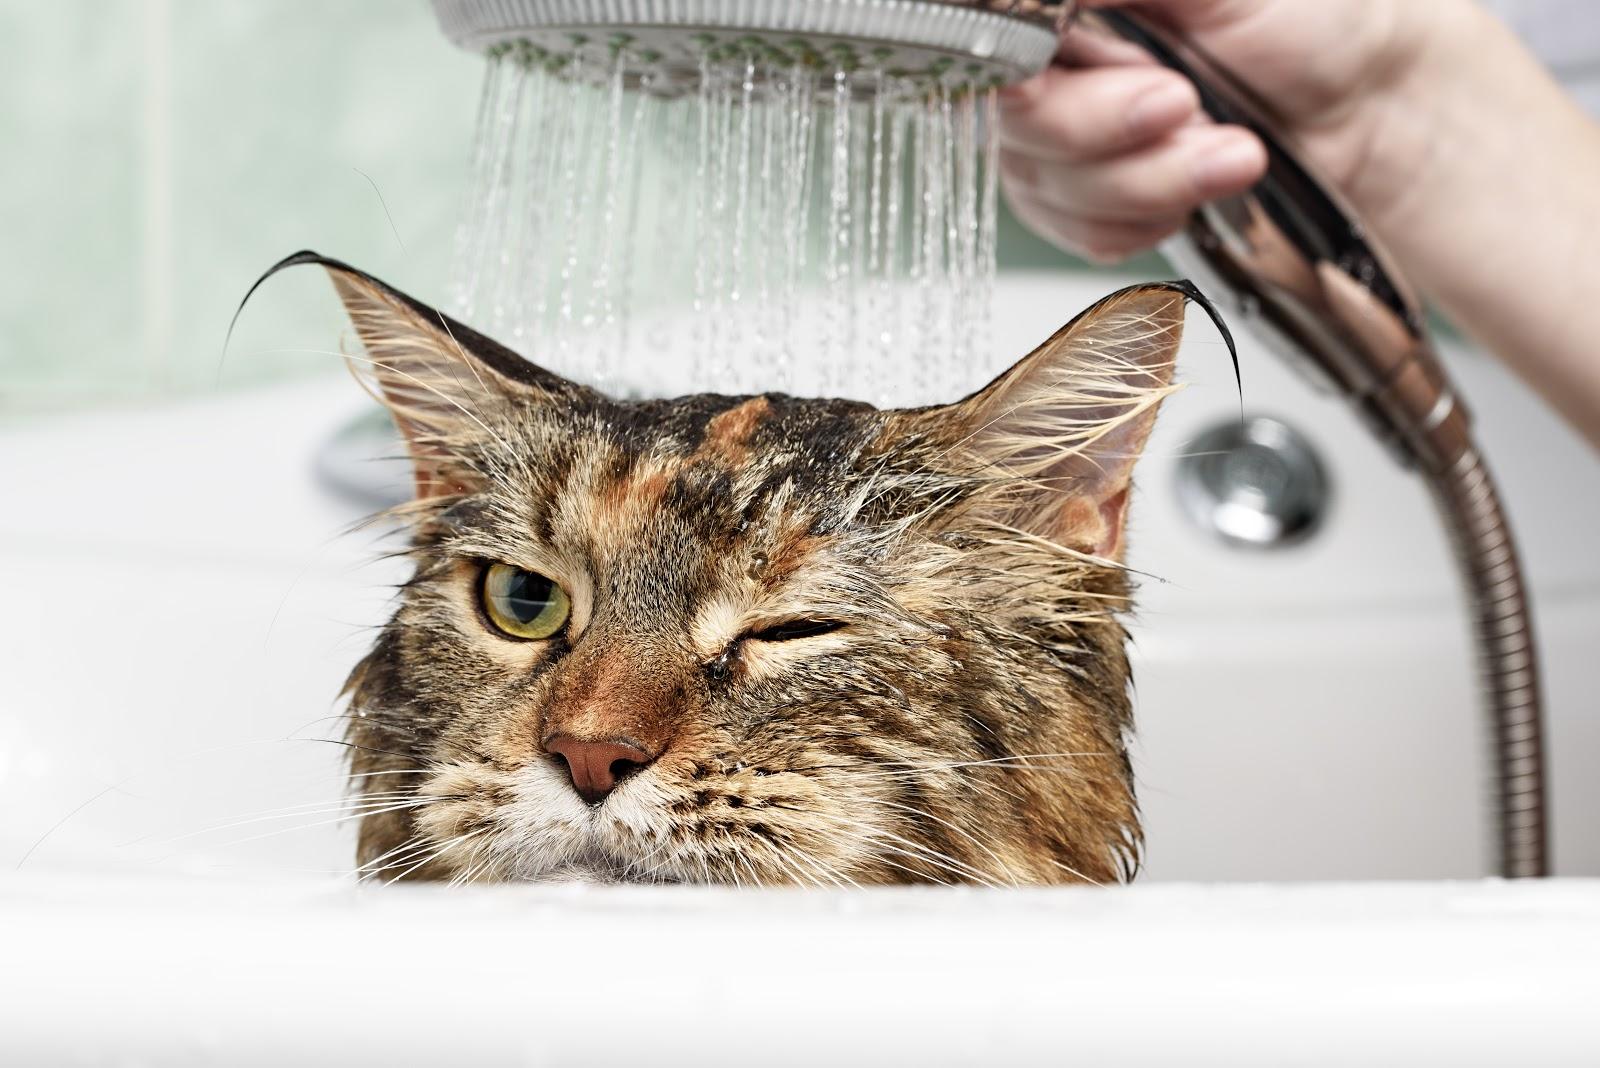 Cat getting a shower